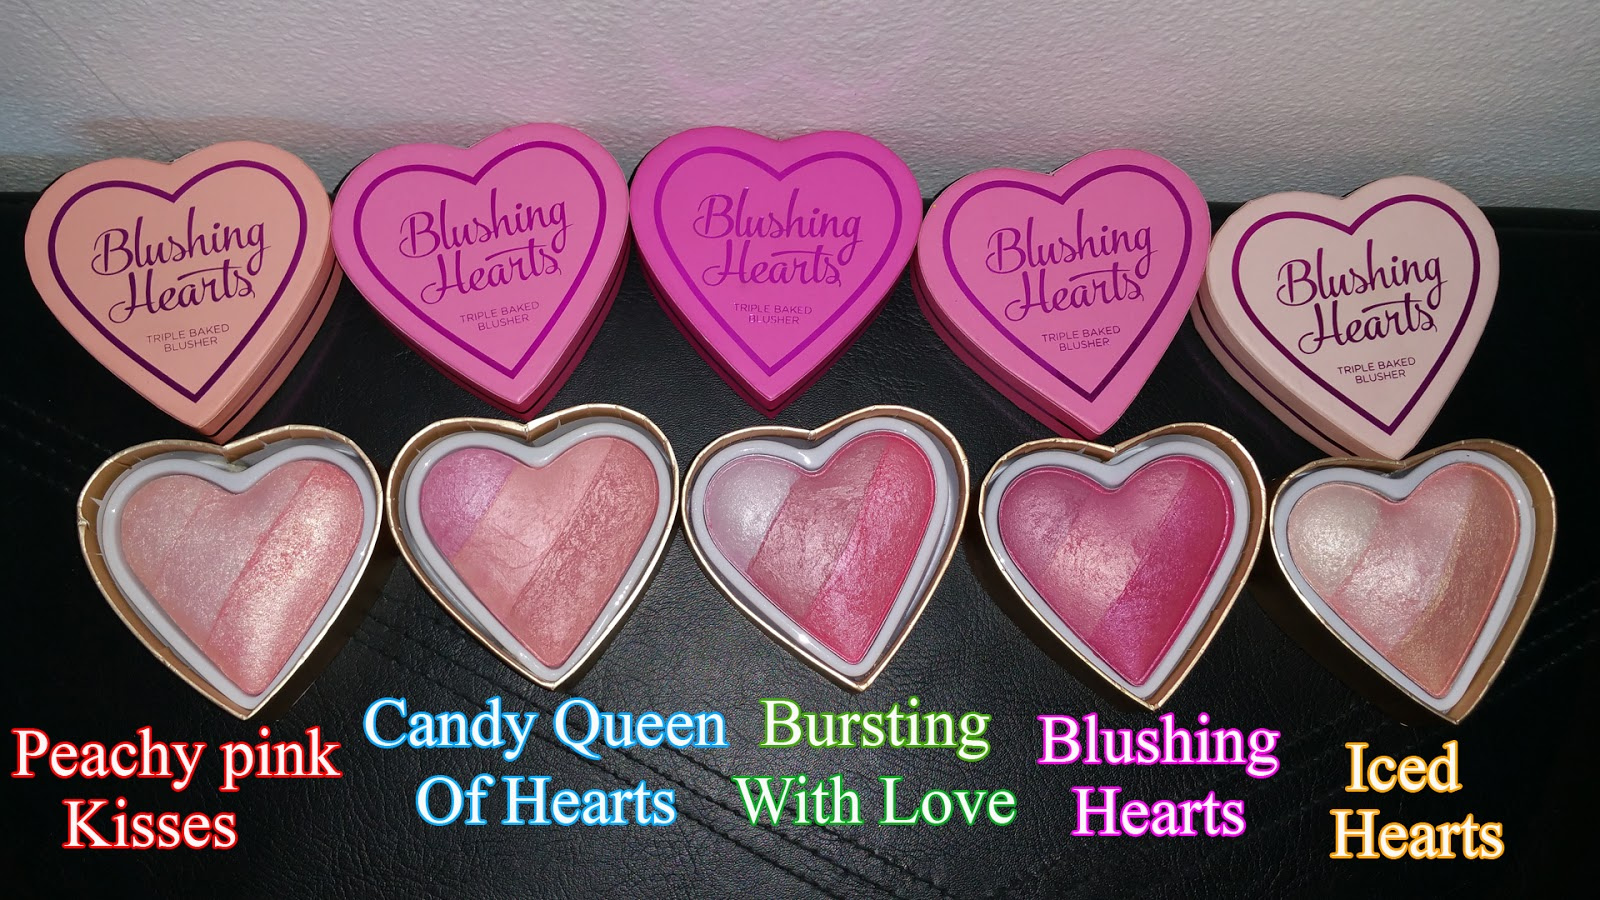 I ♡ Makeup Blushing Hearts Shopping District